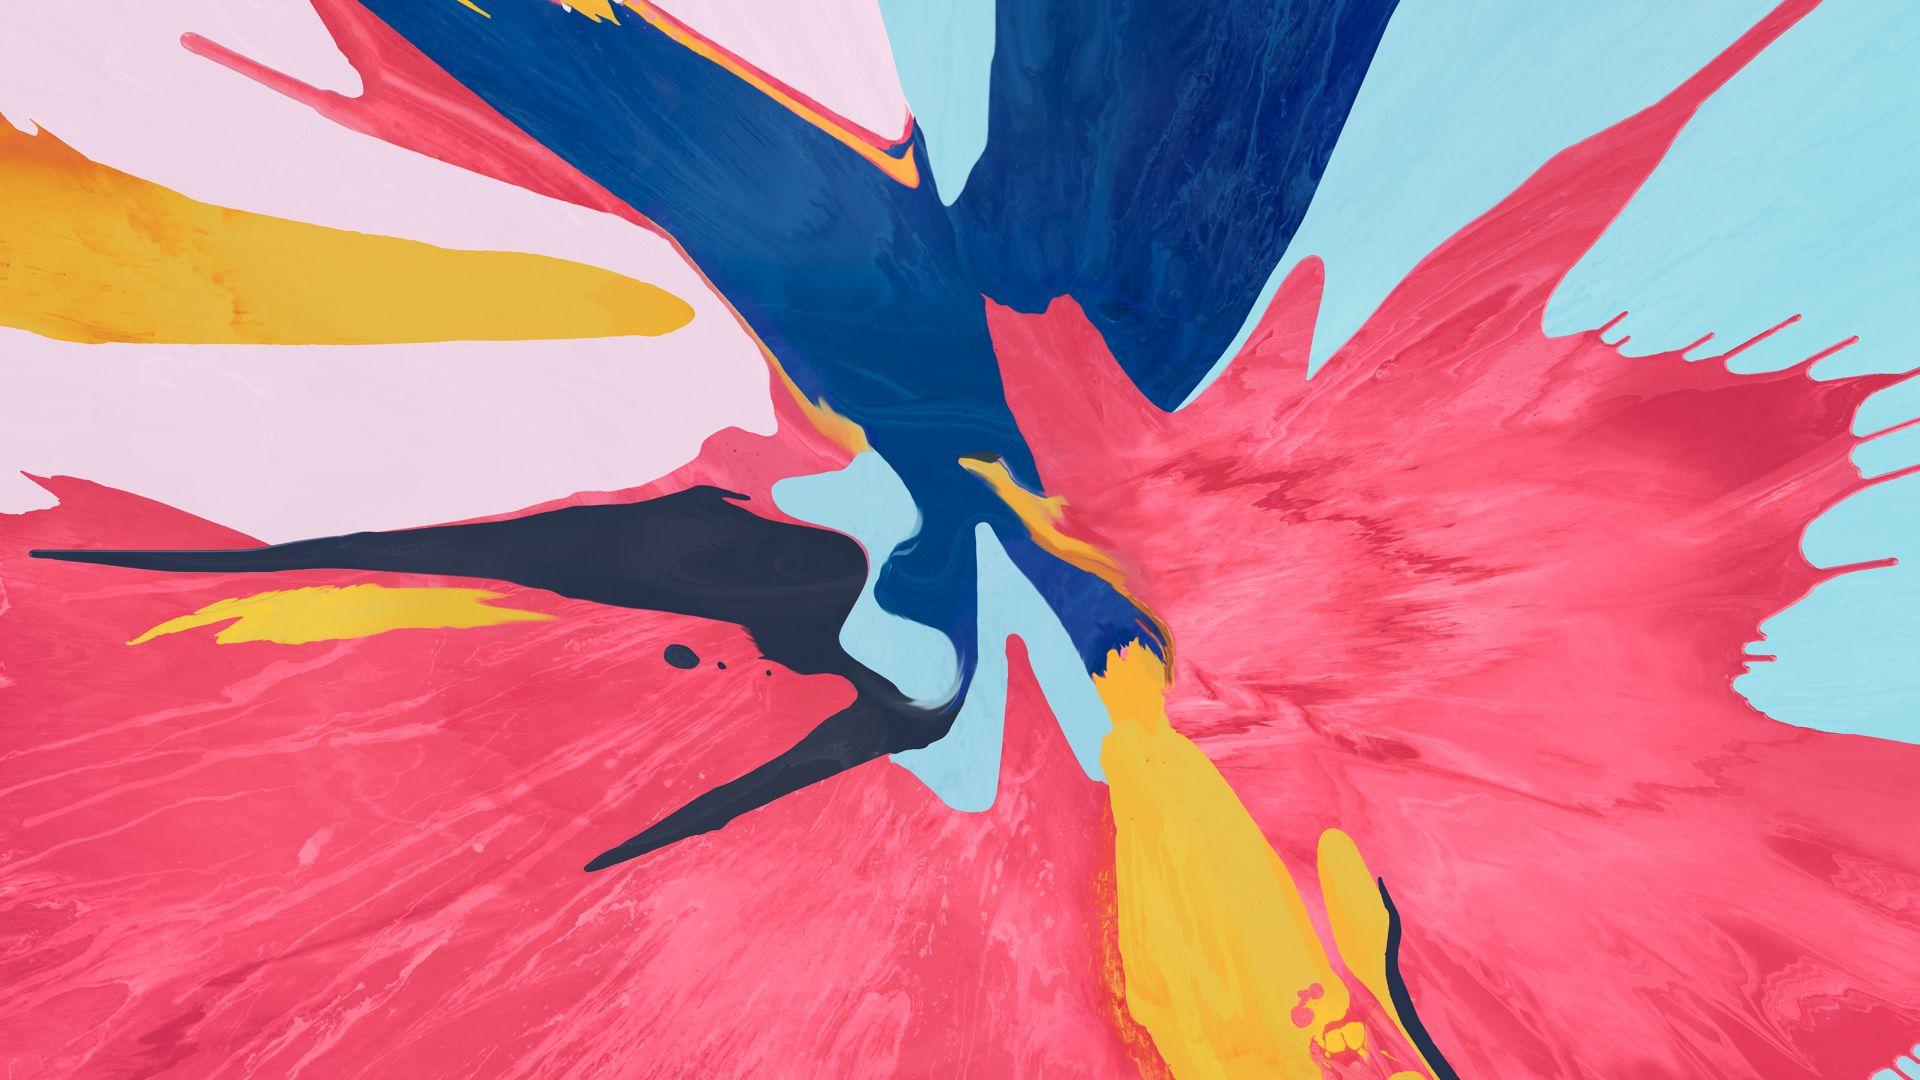 Ipad Mini 3d Abstract Wallpaper: Wallpaper Abstract, Colorful, IPad Pro 2018, 4K, OS #20827